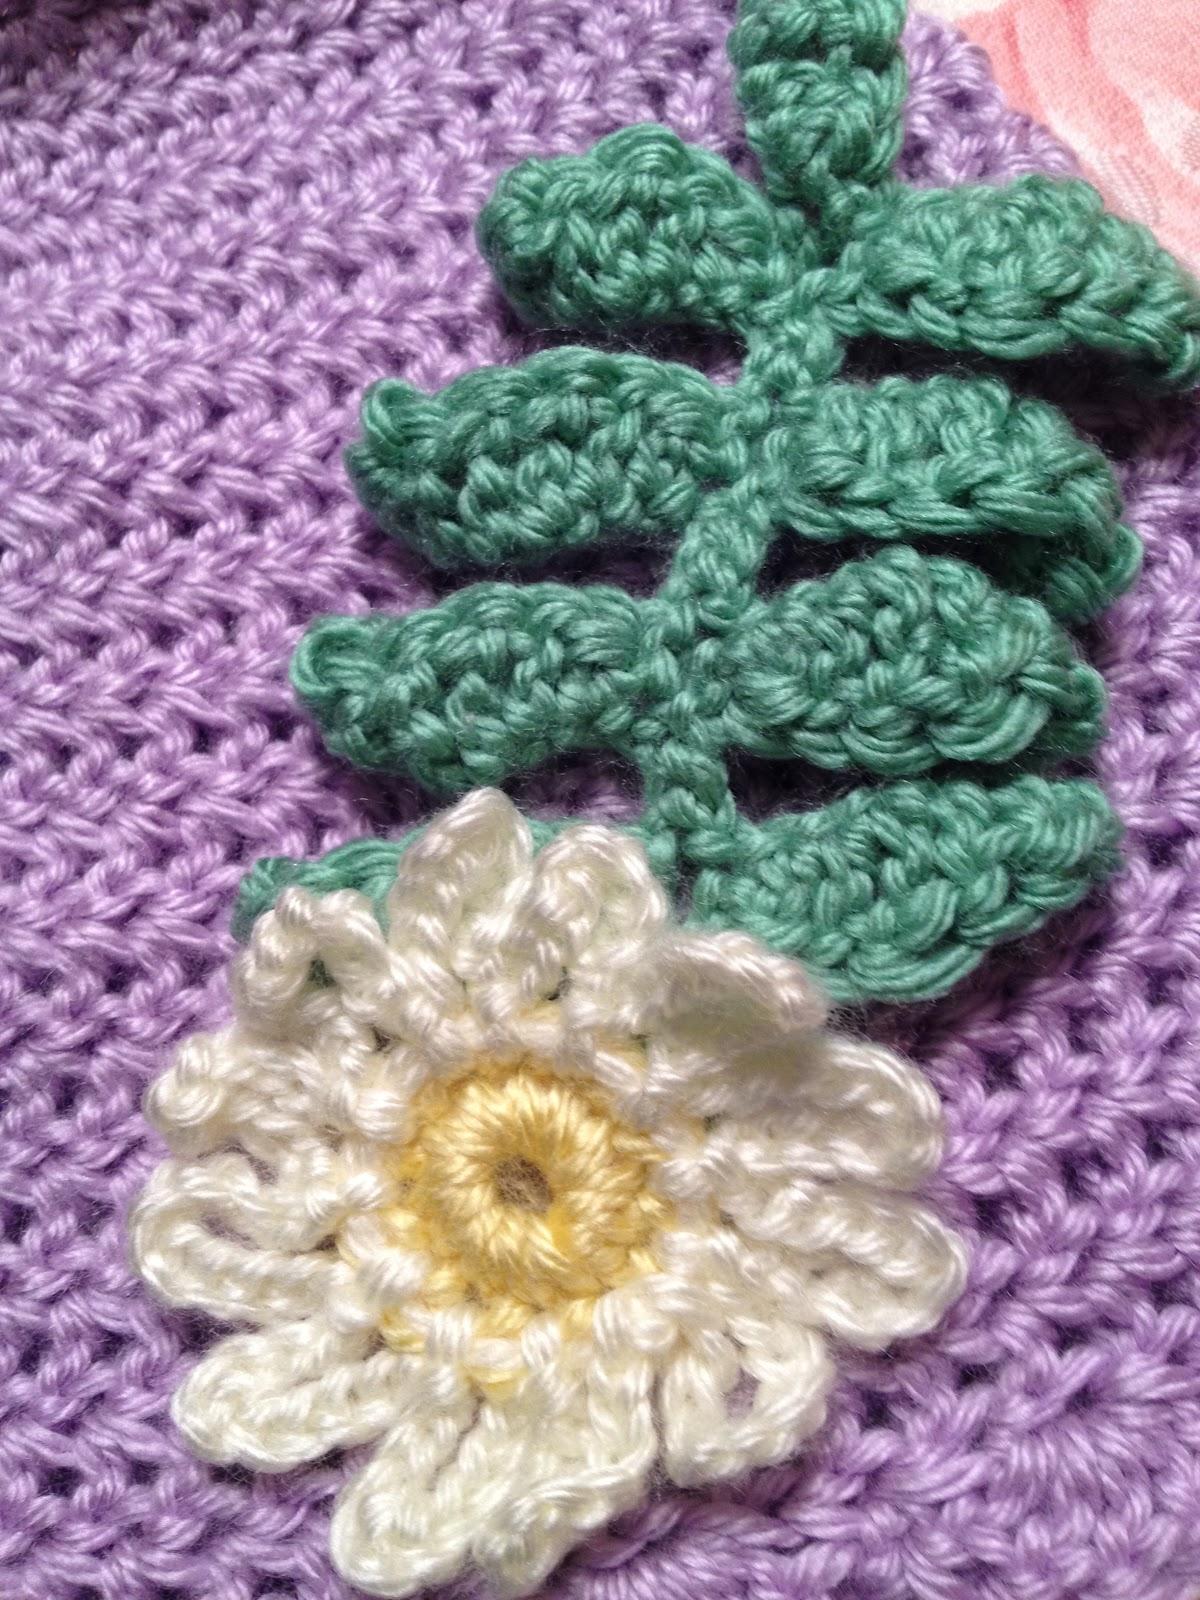 The Crocheted Cupcake: Crochet Fern Leaf